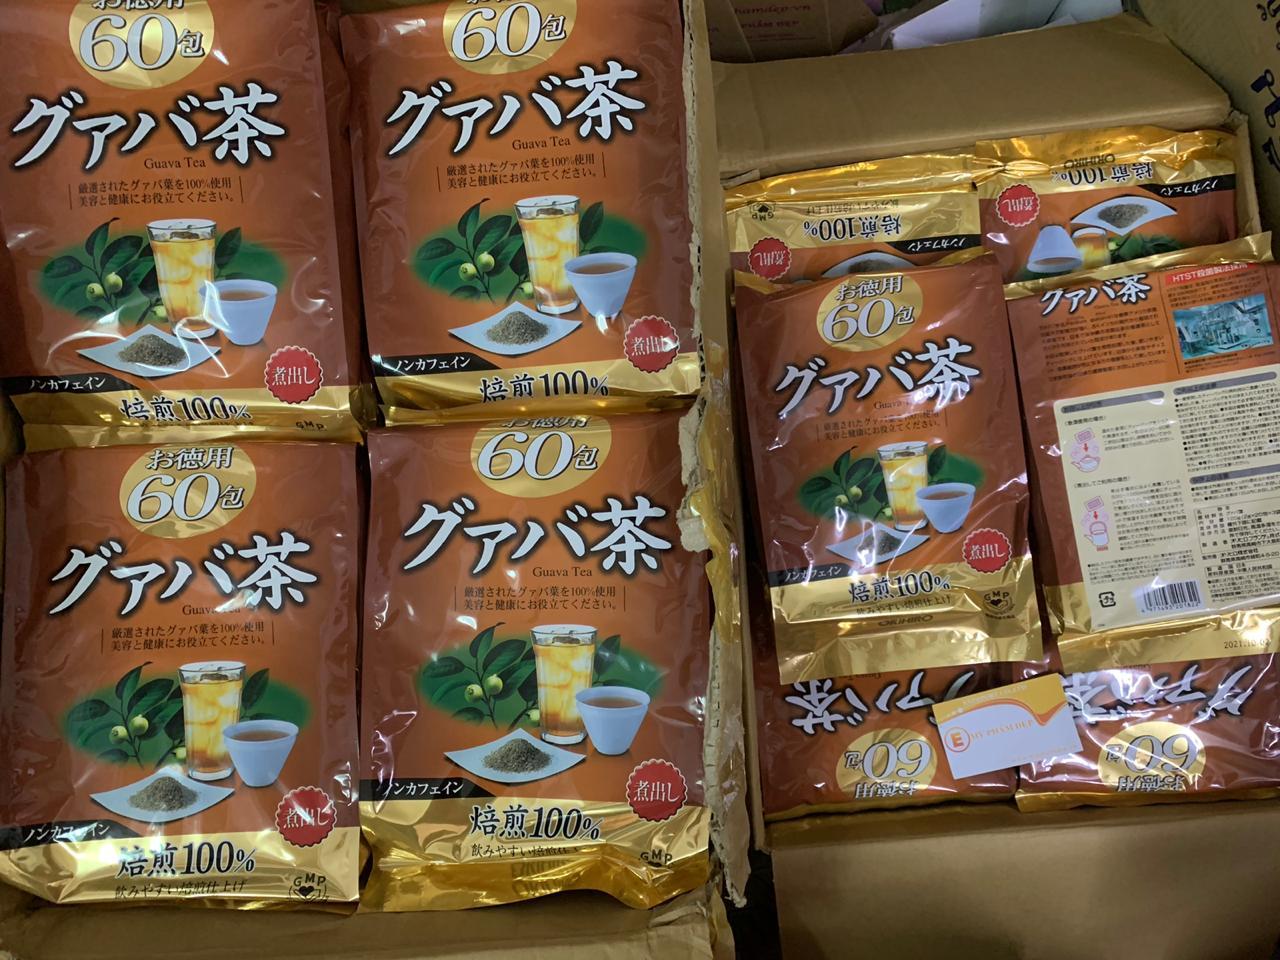 body-tra-giam-can-vi-oi-orihiro-guava-tea-60-goi-nhat-ban-2557